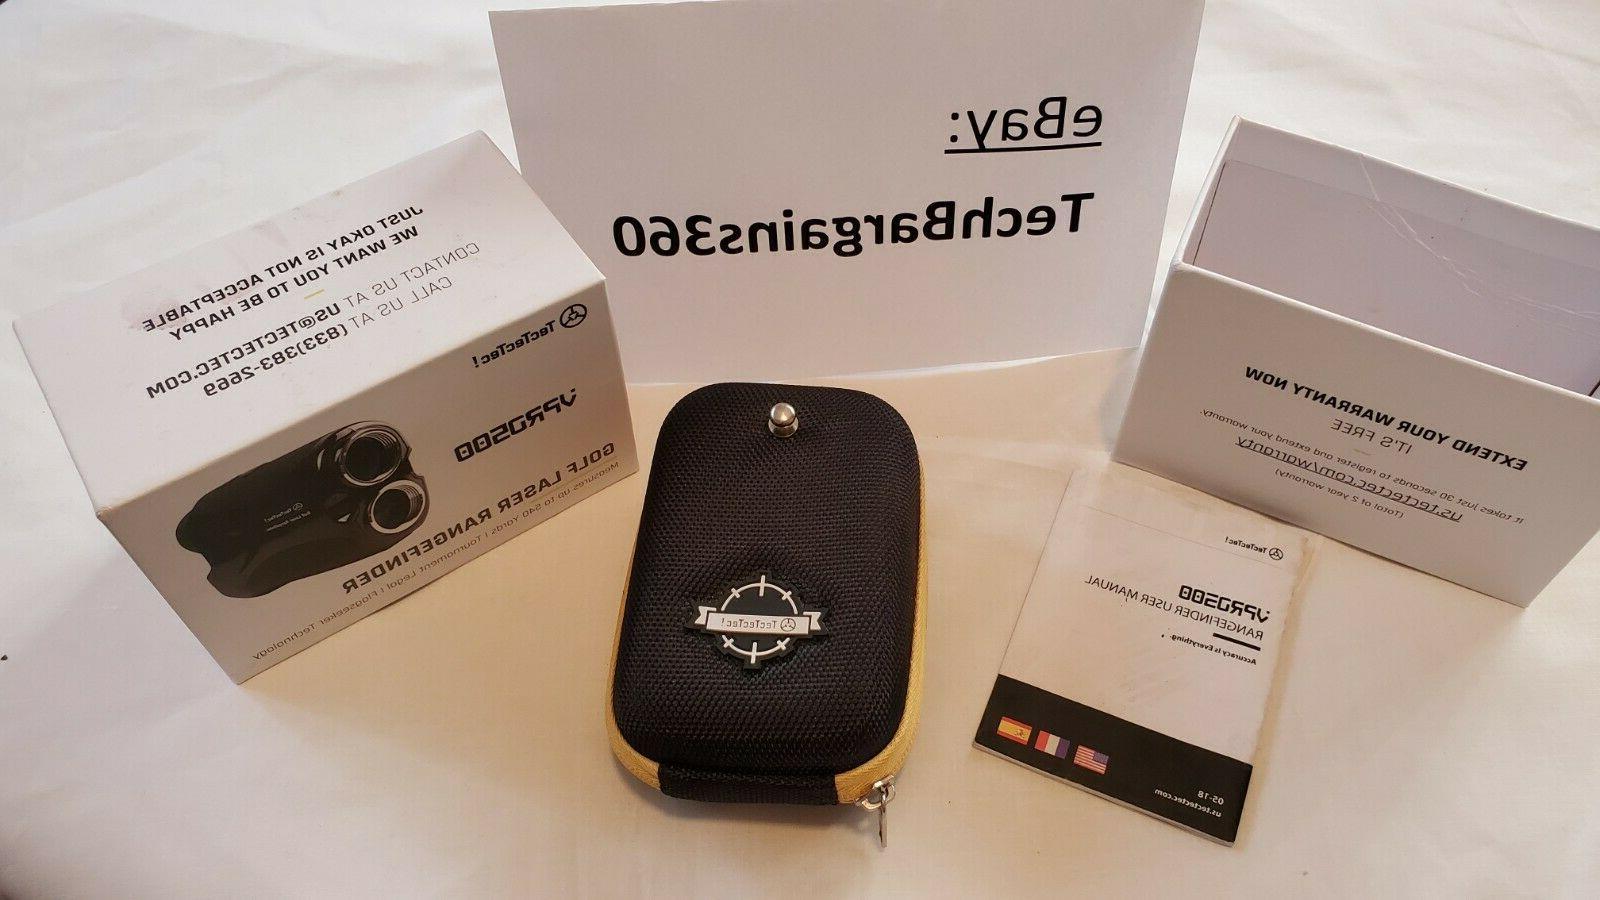 Brand-New Box TecTecTec VPRO500 Golf Laser Range